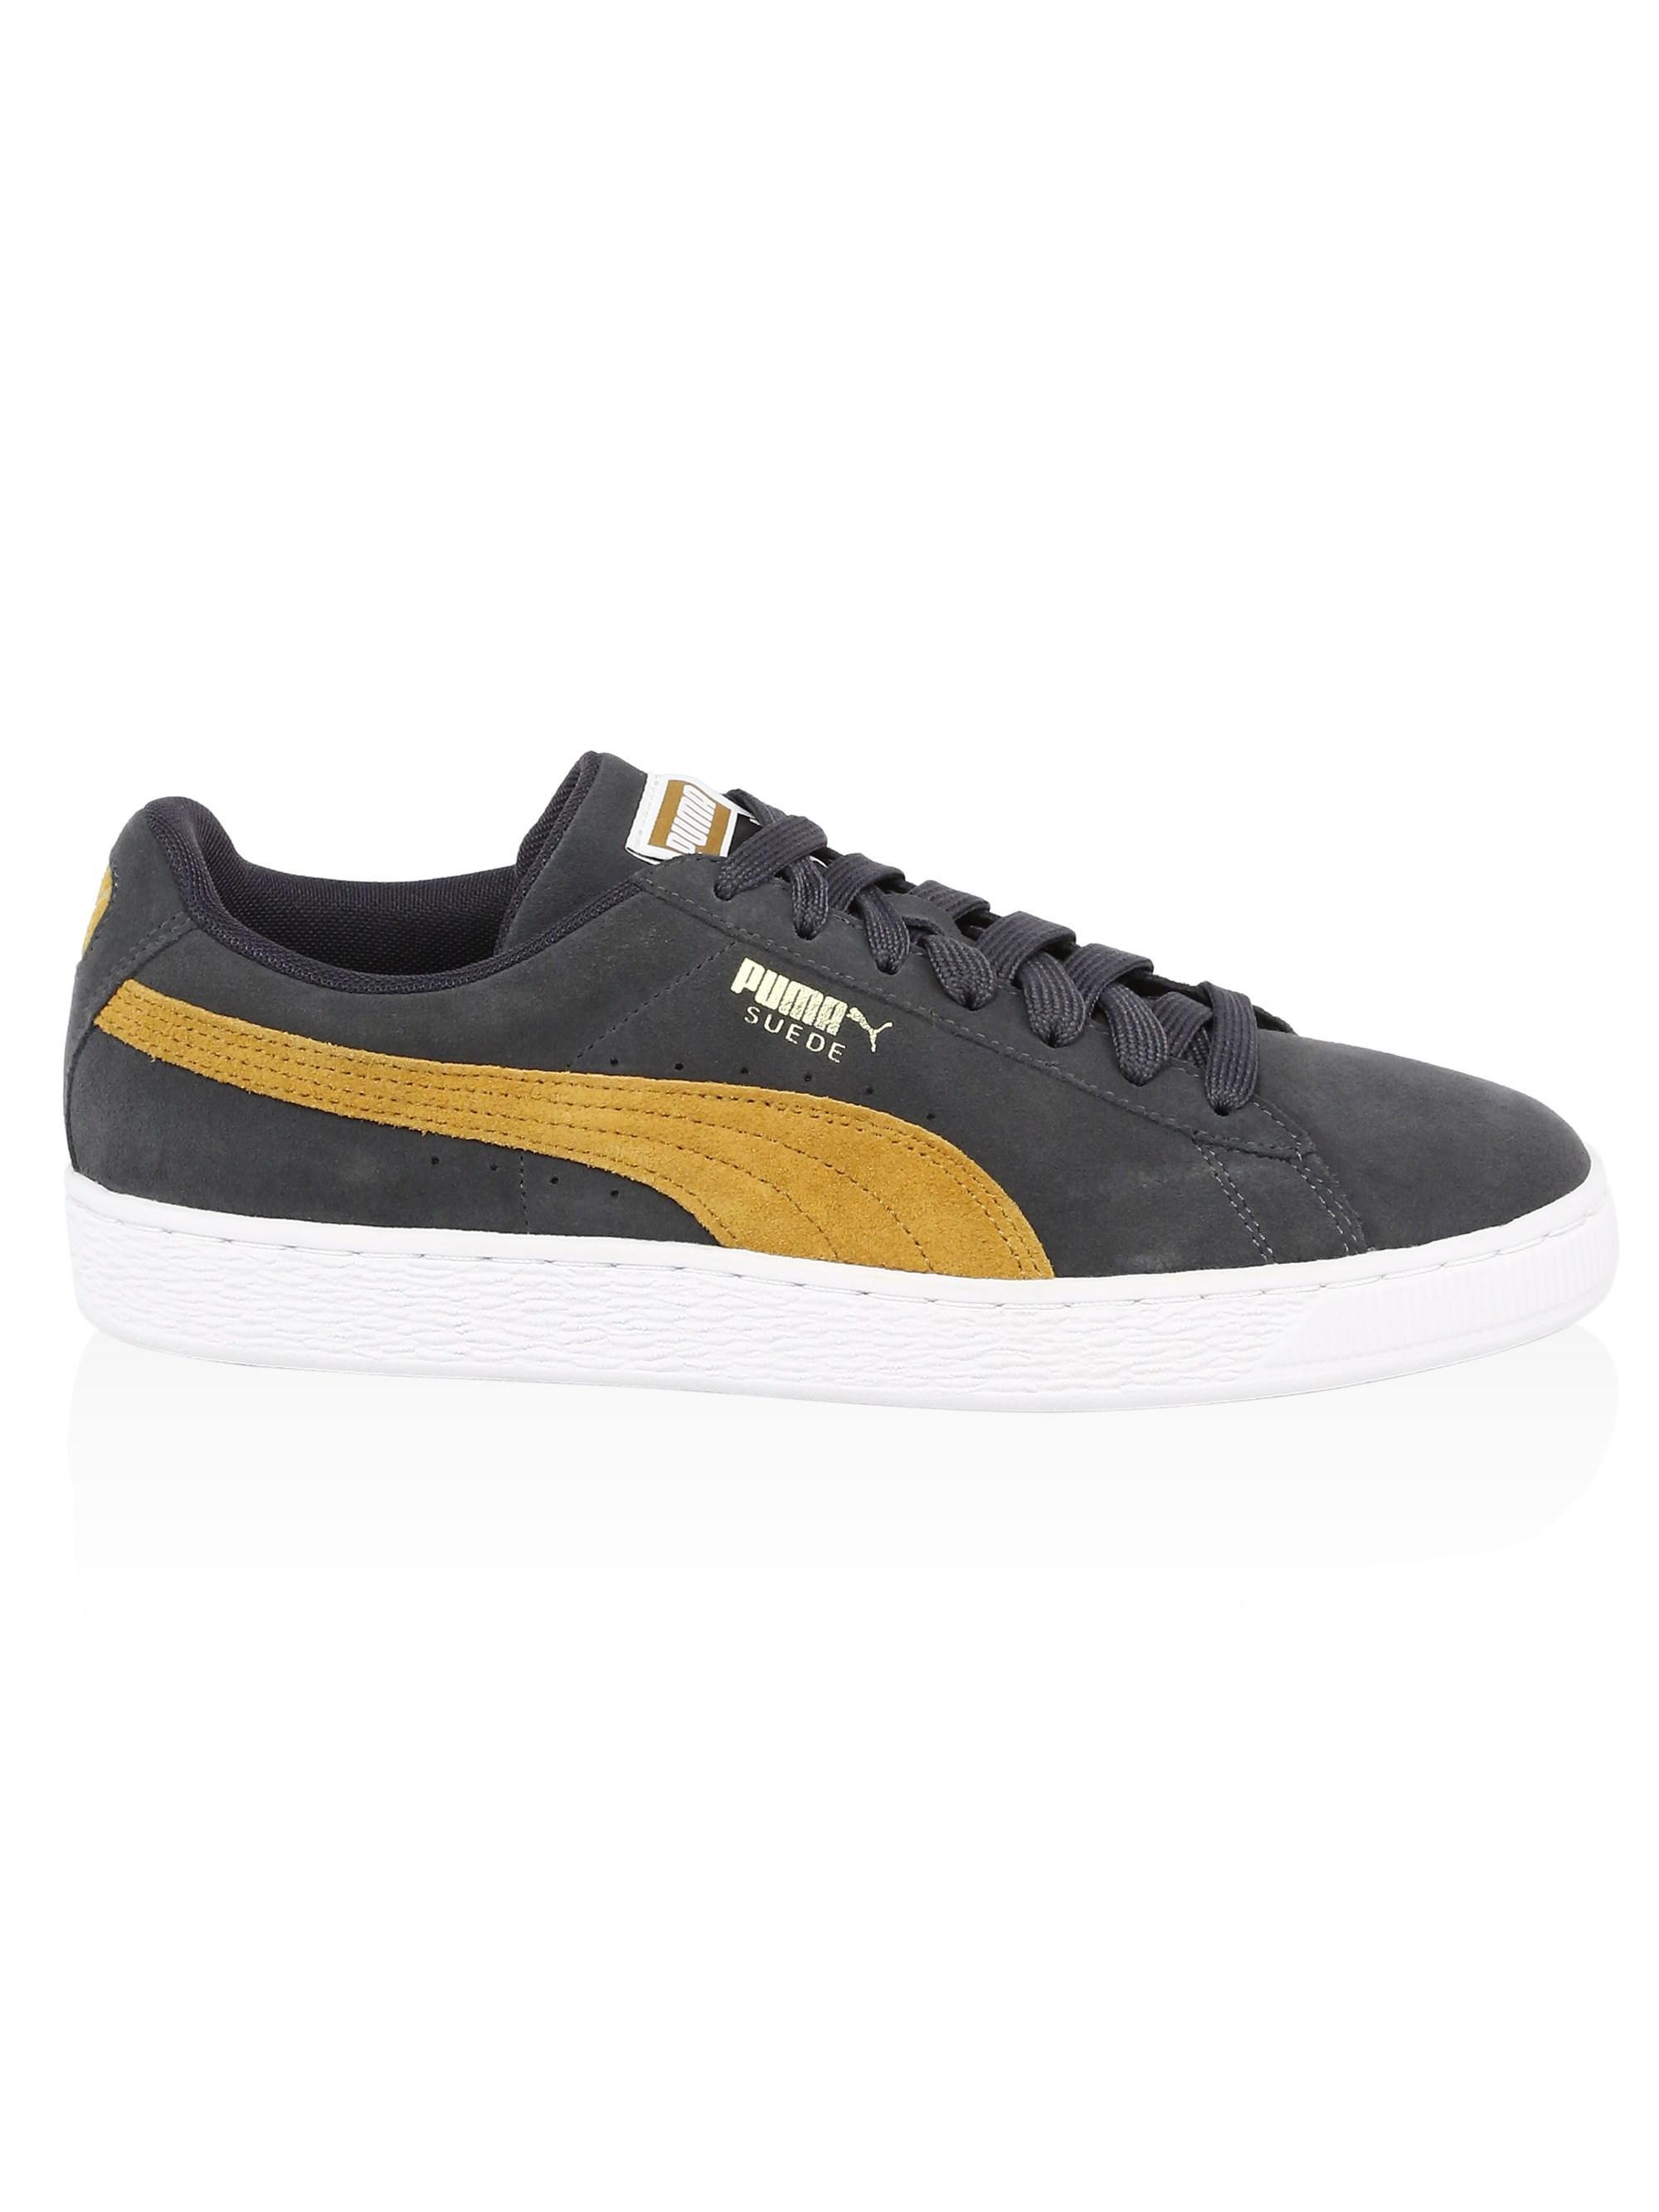 19aa8787de32 PUMA Men s Suede Classic Iron Gate Sneakers - Iron Gate - Size 8 for ...